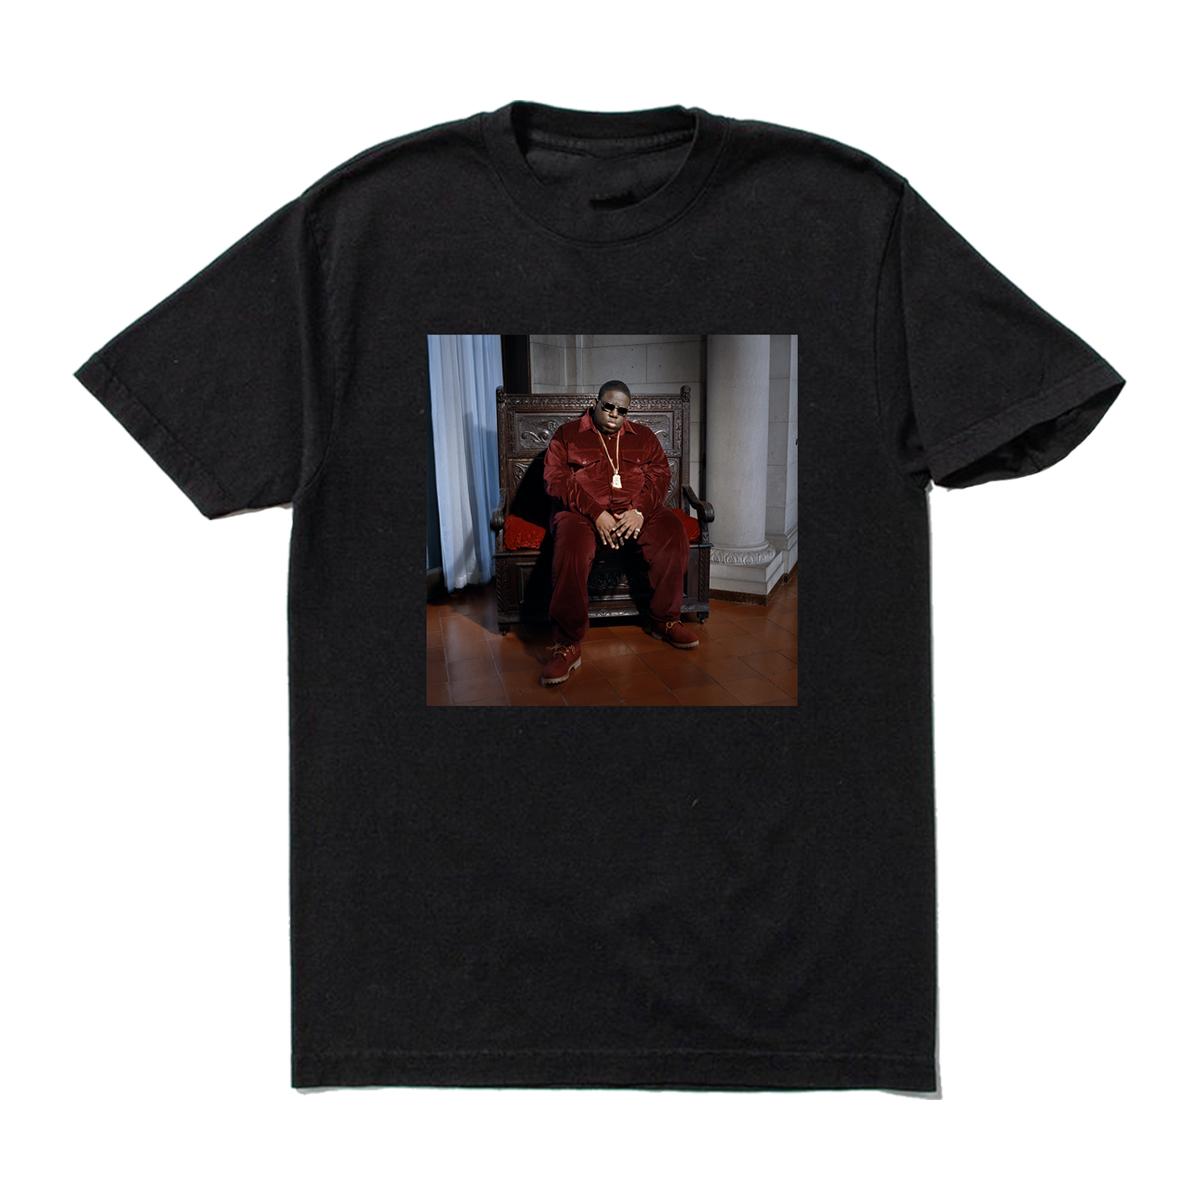 Velour Throne T-Shirt